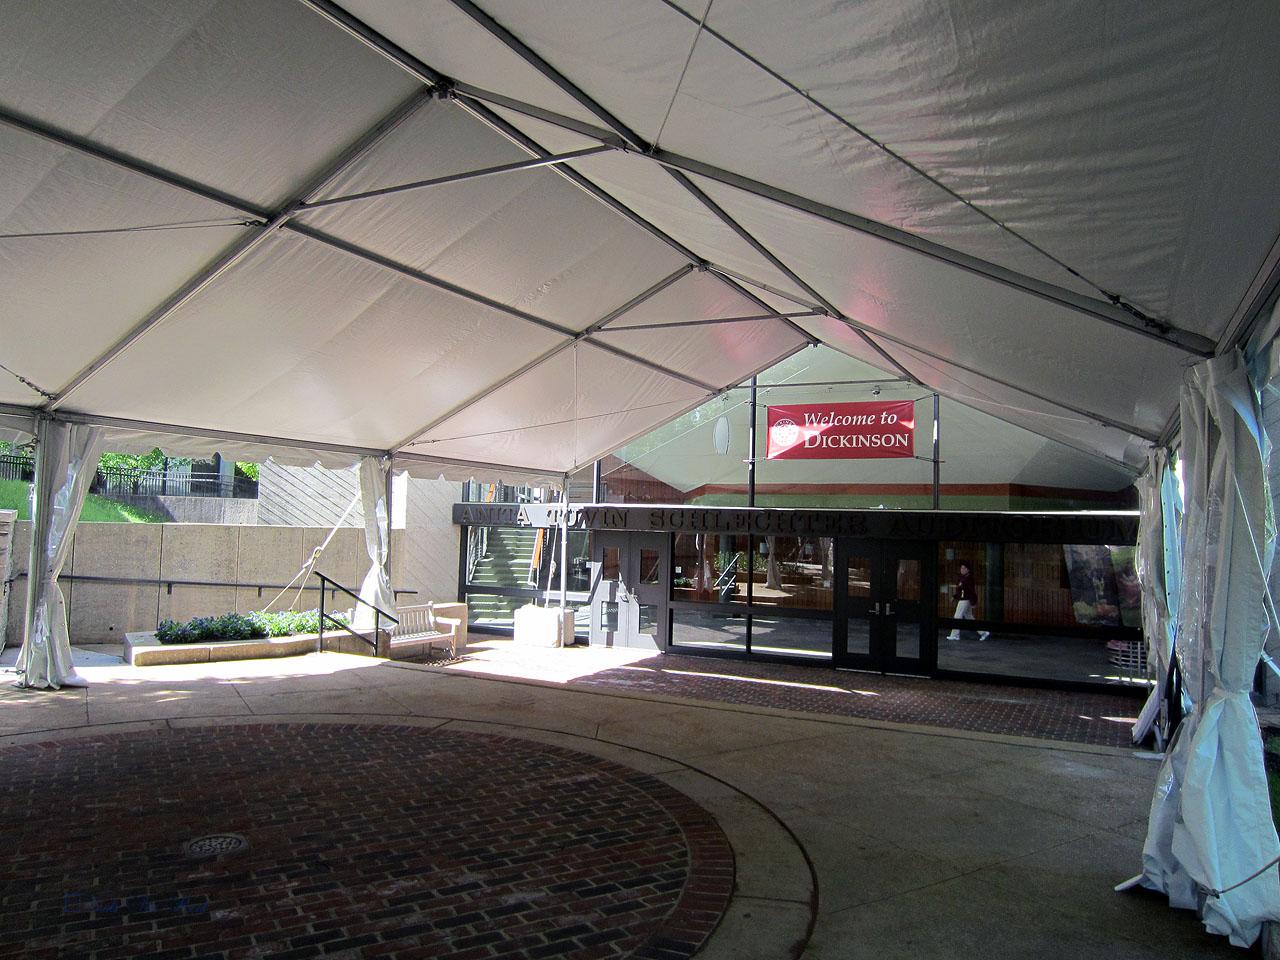 College tent rental